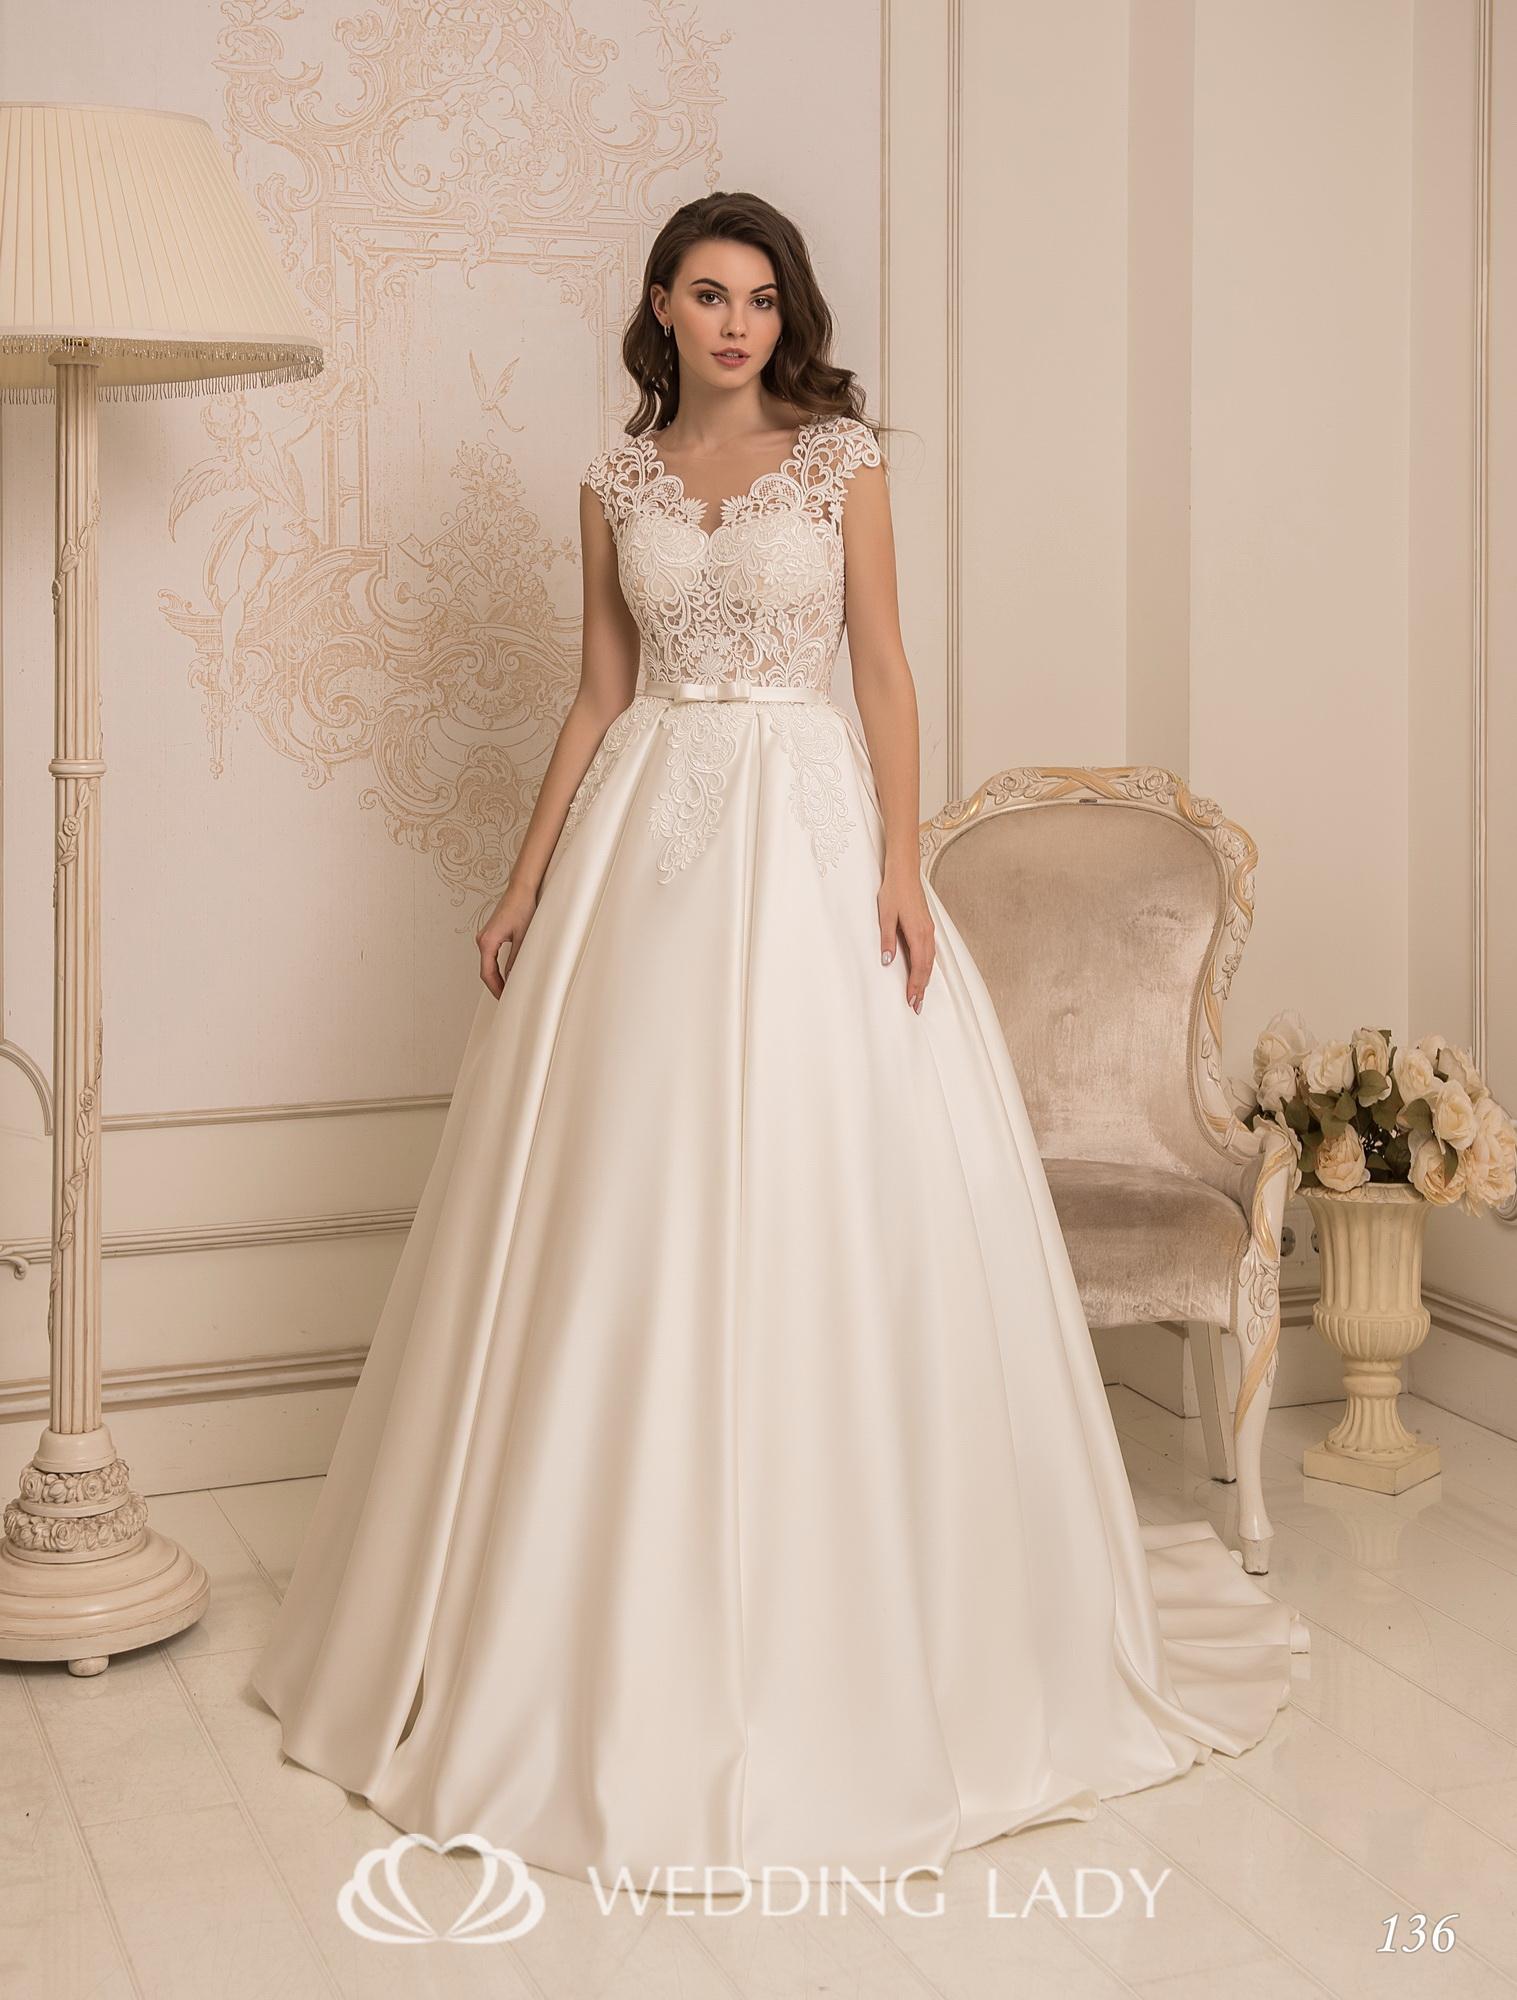 https://wedding-lady.com/images/stories/virtuemart/product/136-------(1).jpg